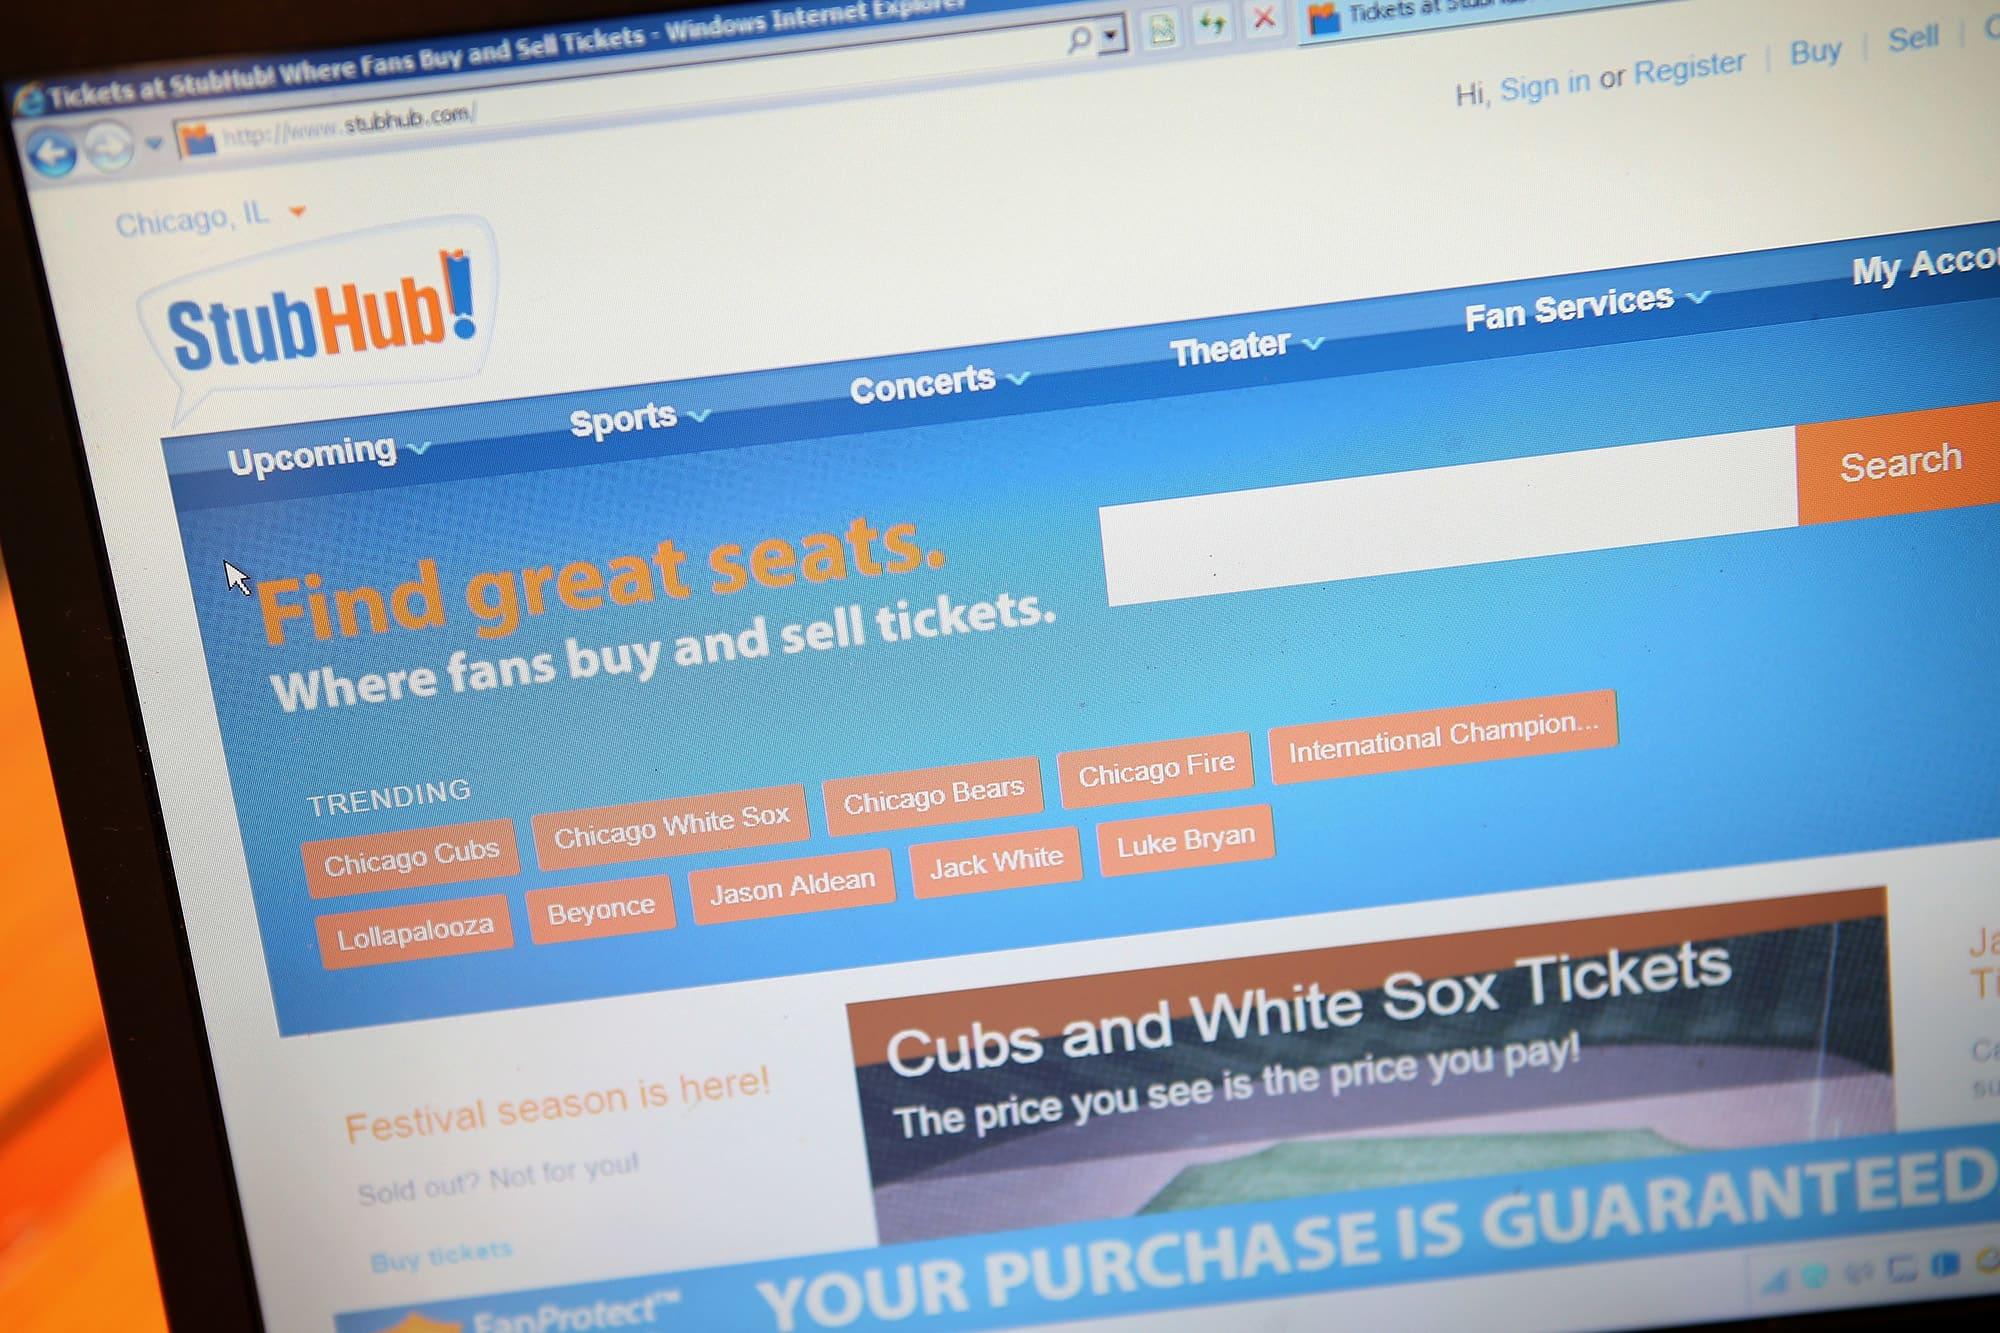 EBay to sell StubHub to Viagogo for about $4 billion in cash